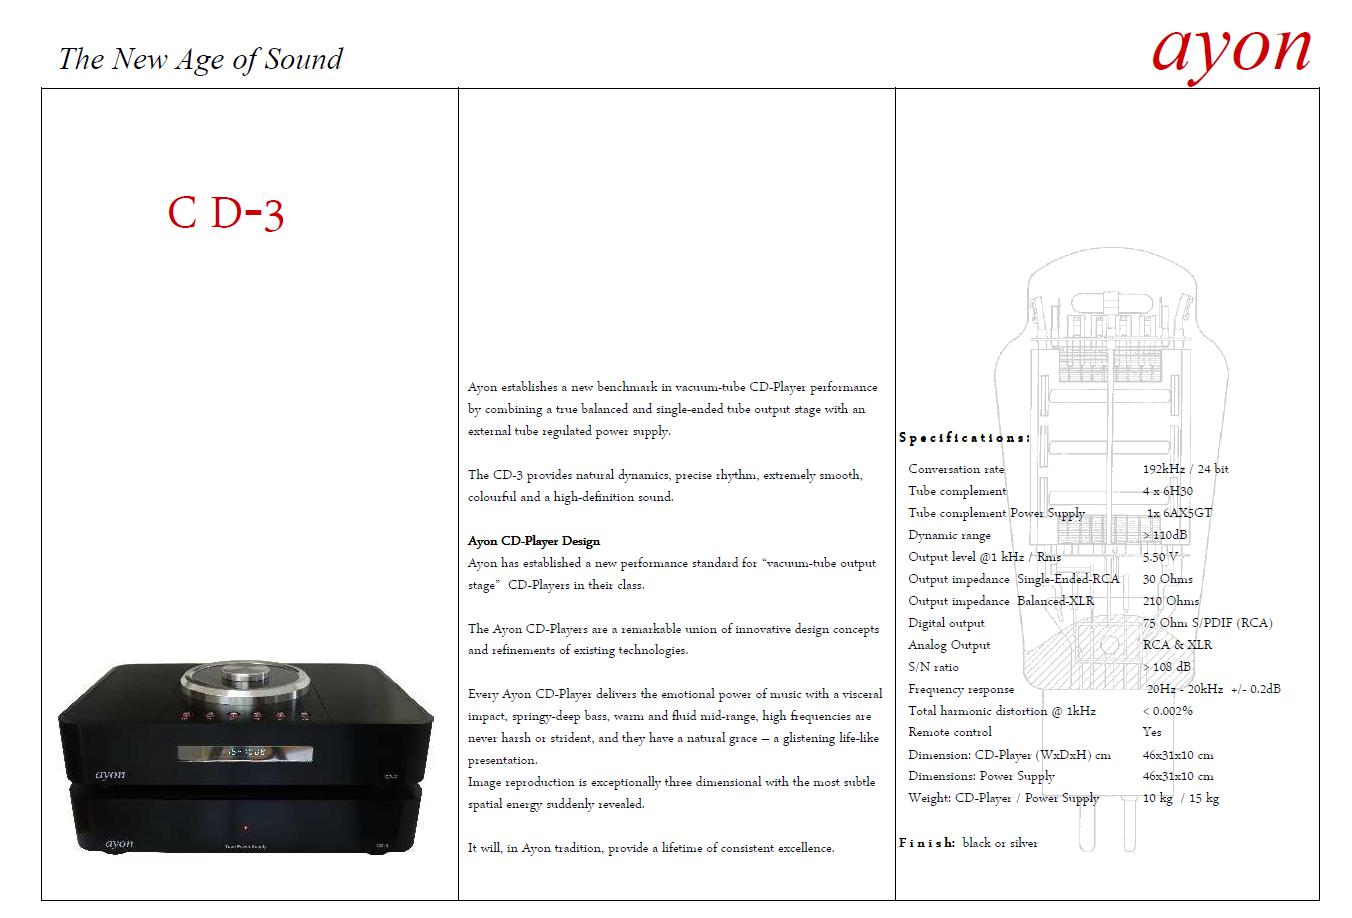 2020-06-16 23_06_15-CD-3_Brochure_e-2.pdf - Adobe Acrobat Reader DC.png